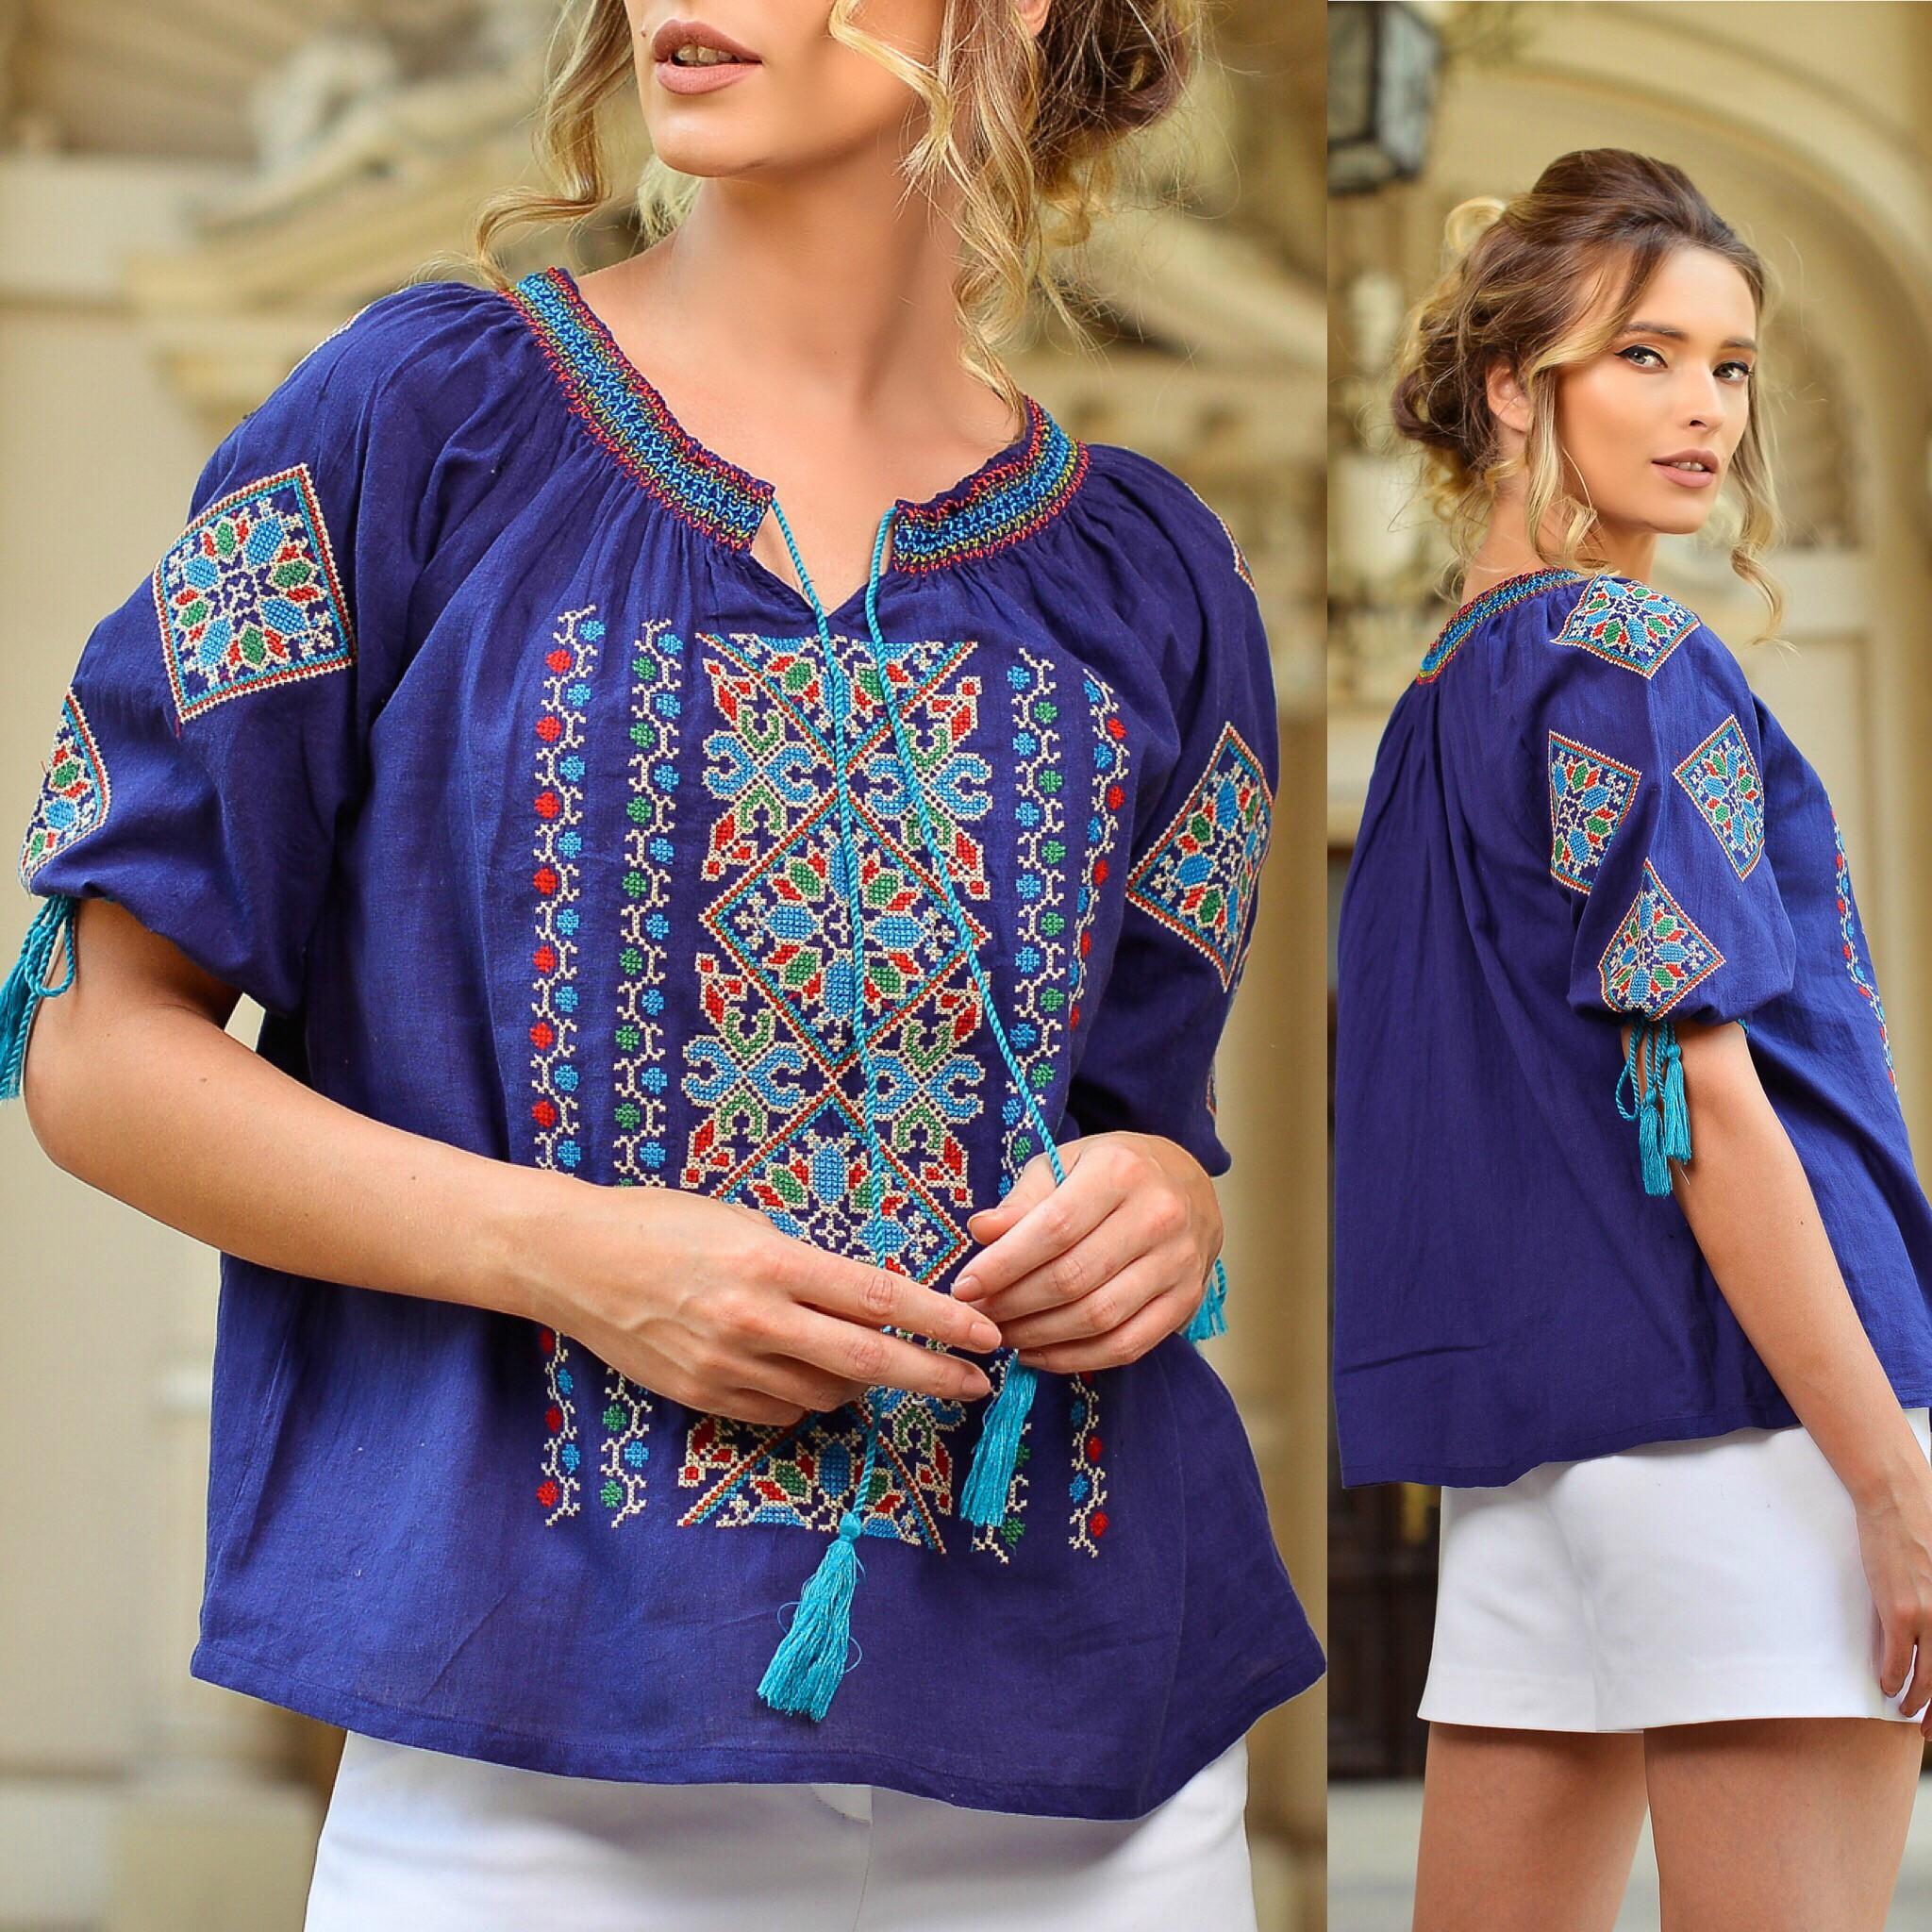 Reducere Bluza traditionala brodata Magda bleumarin | Goosales.ro